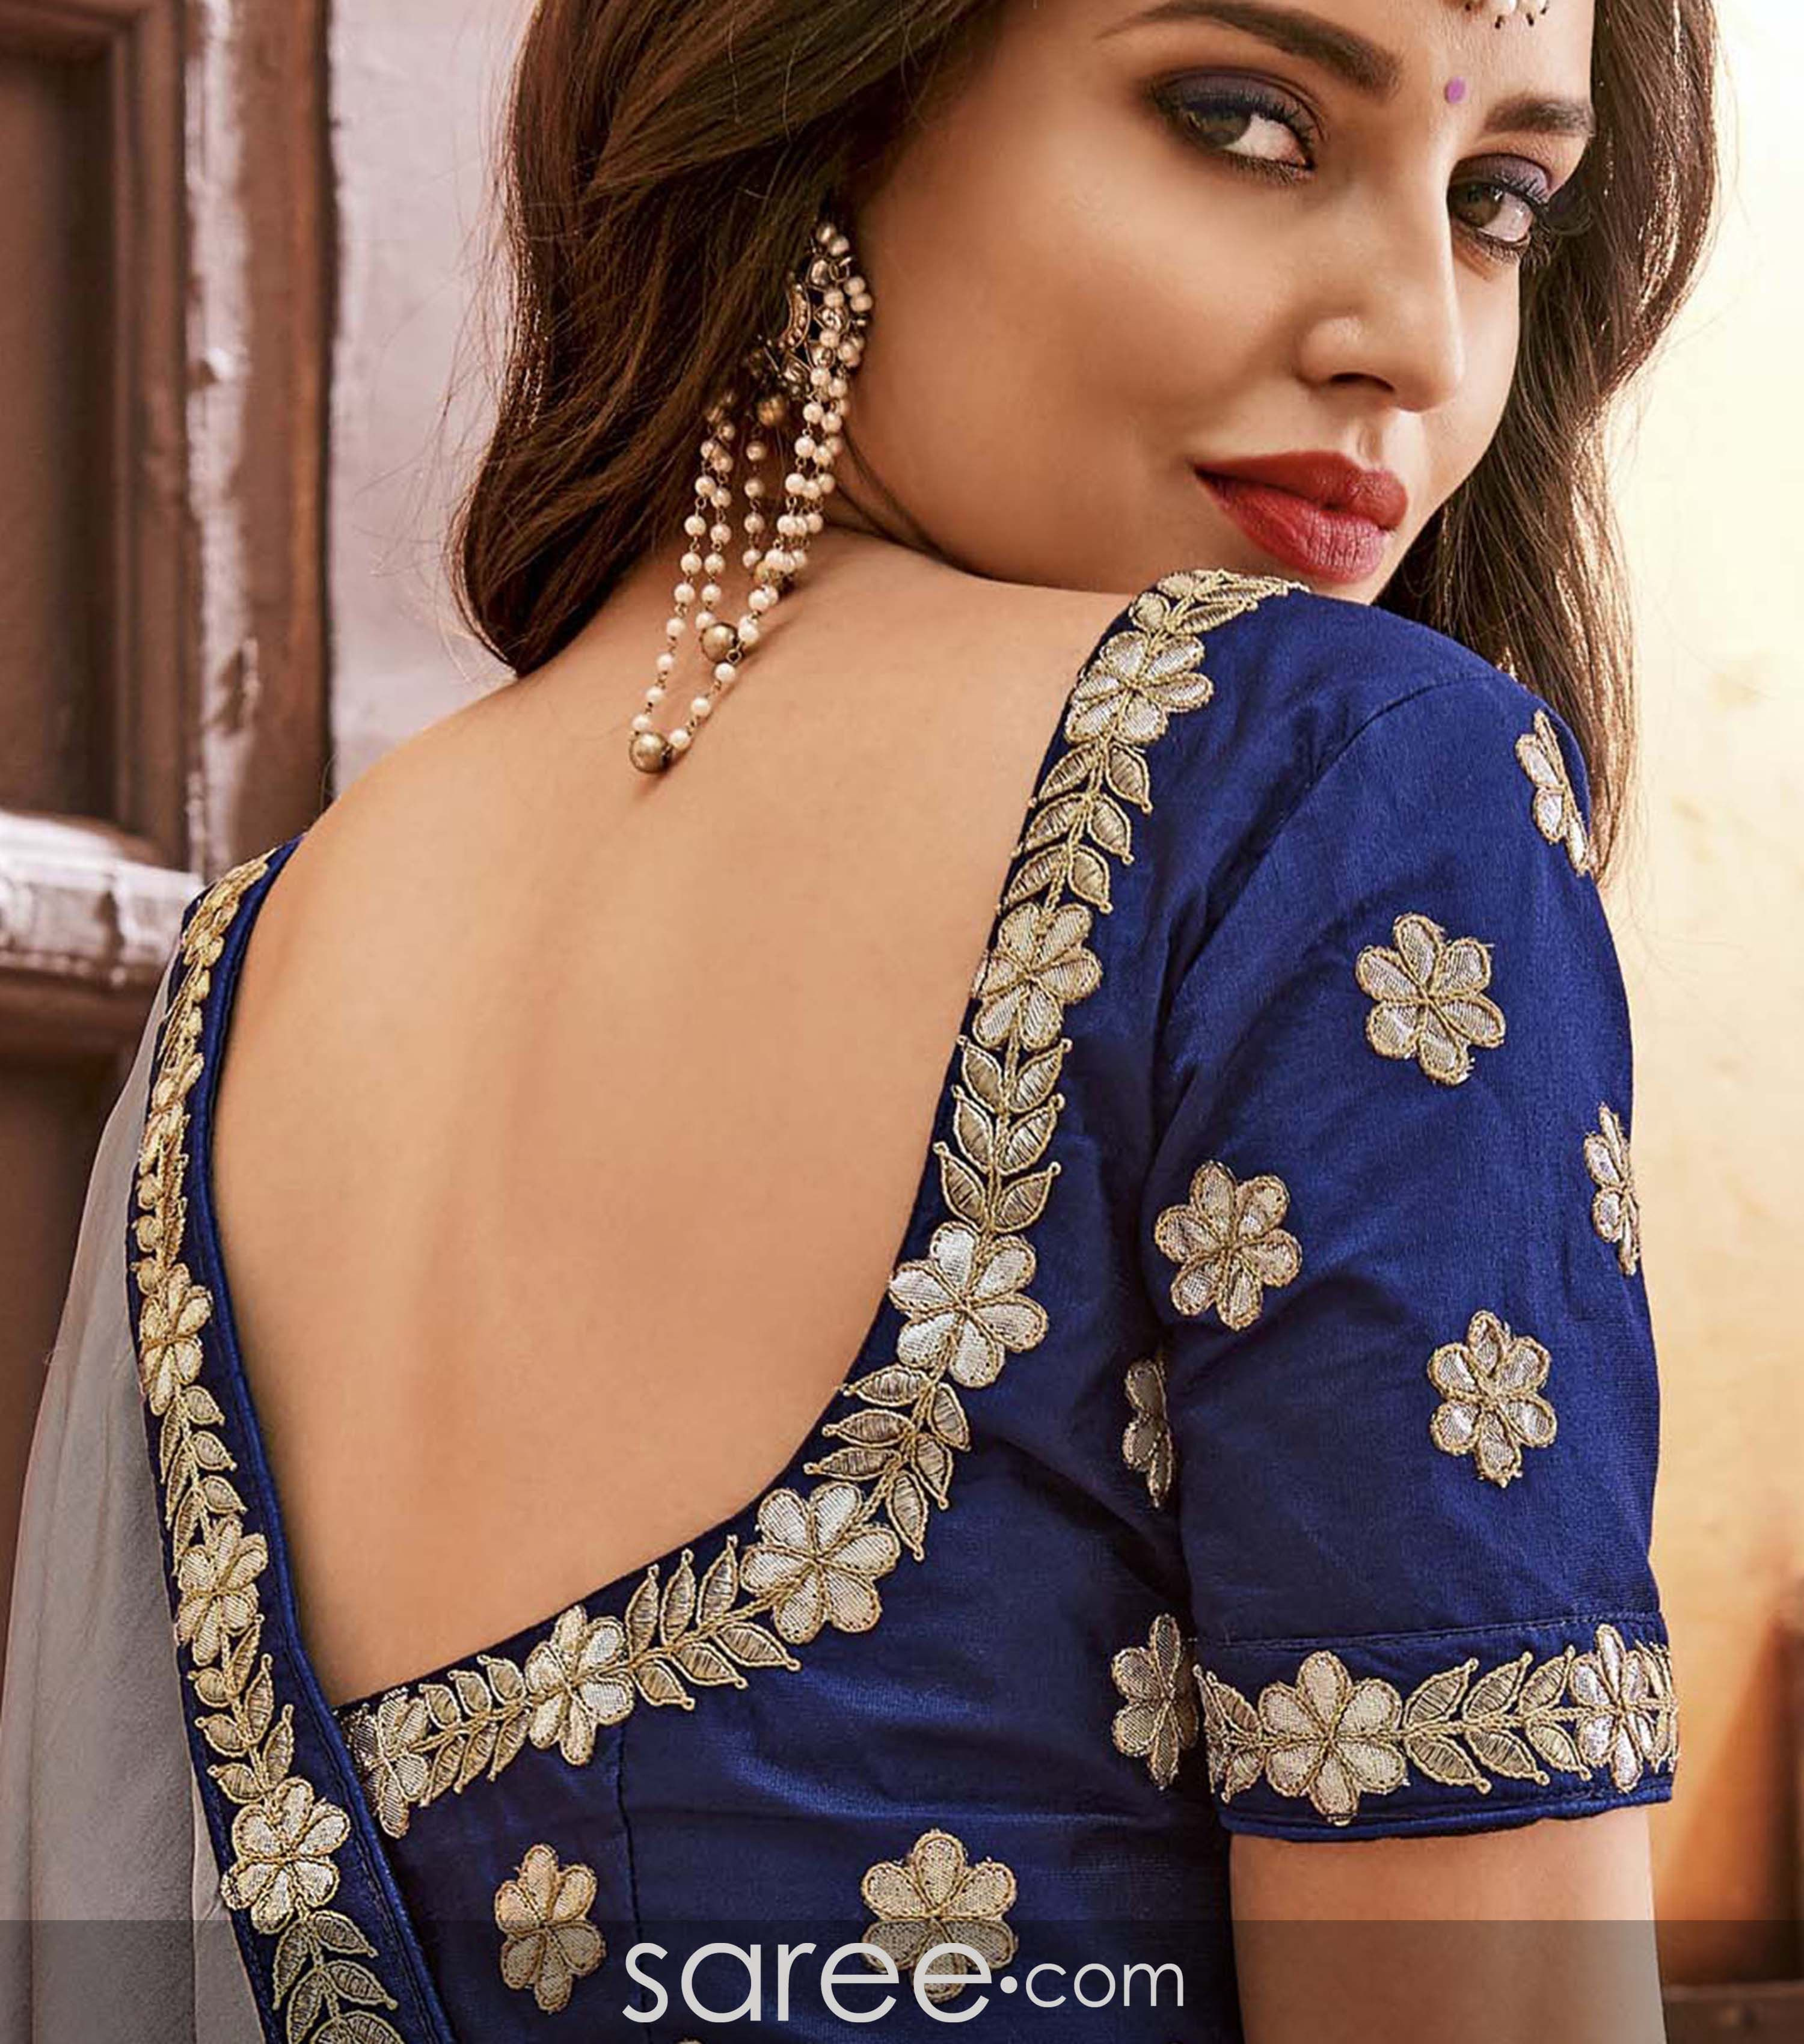 Grey Saree With Blue Deep Neck Blouse Design Blouse Neck Designs Backless Blouse Designs Blouse Designs